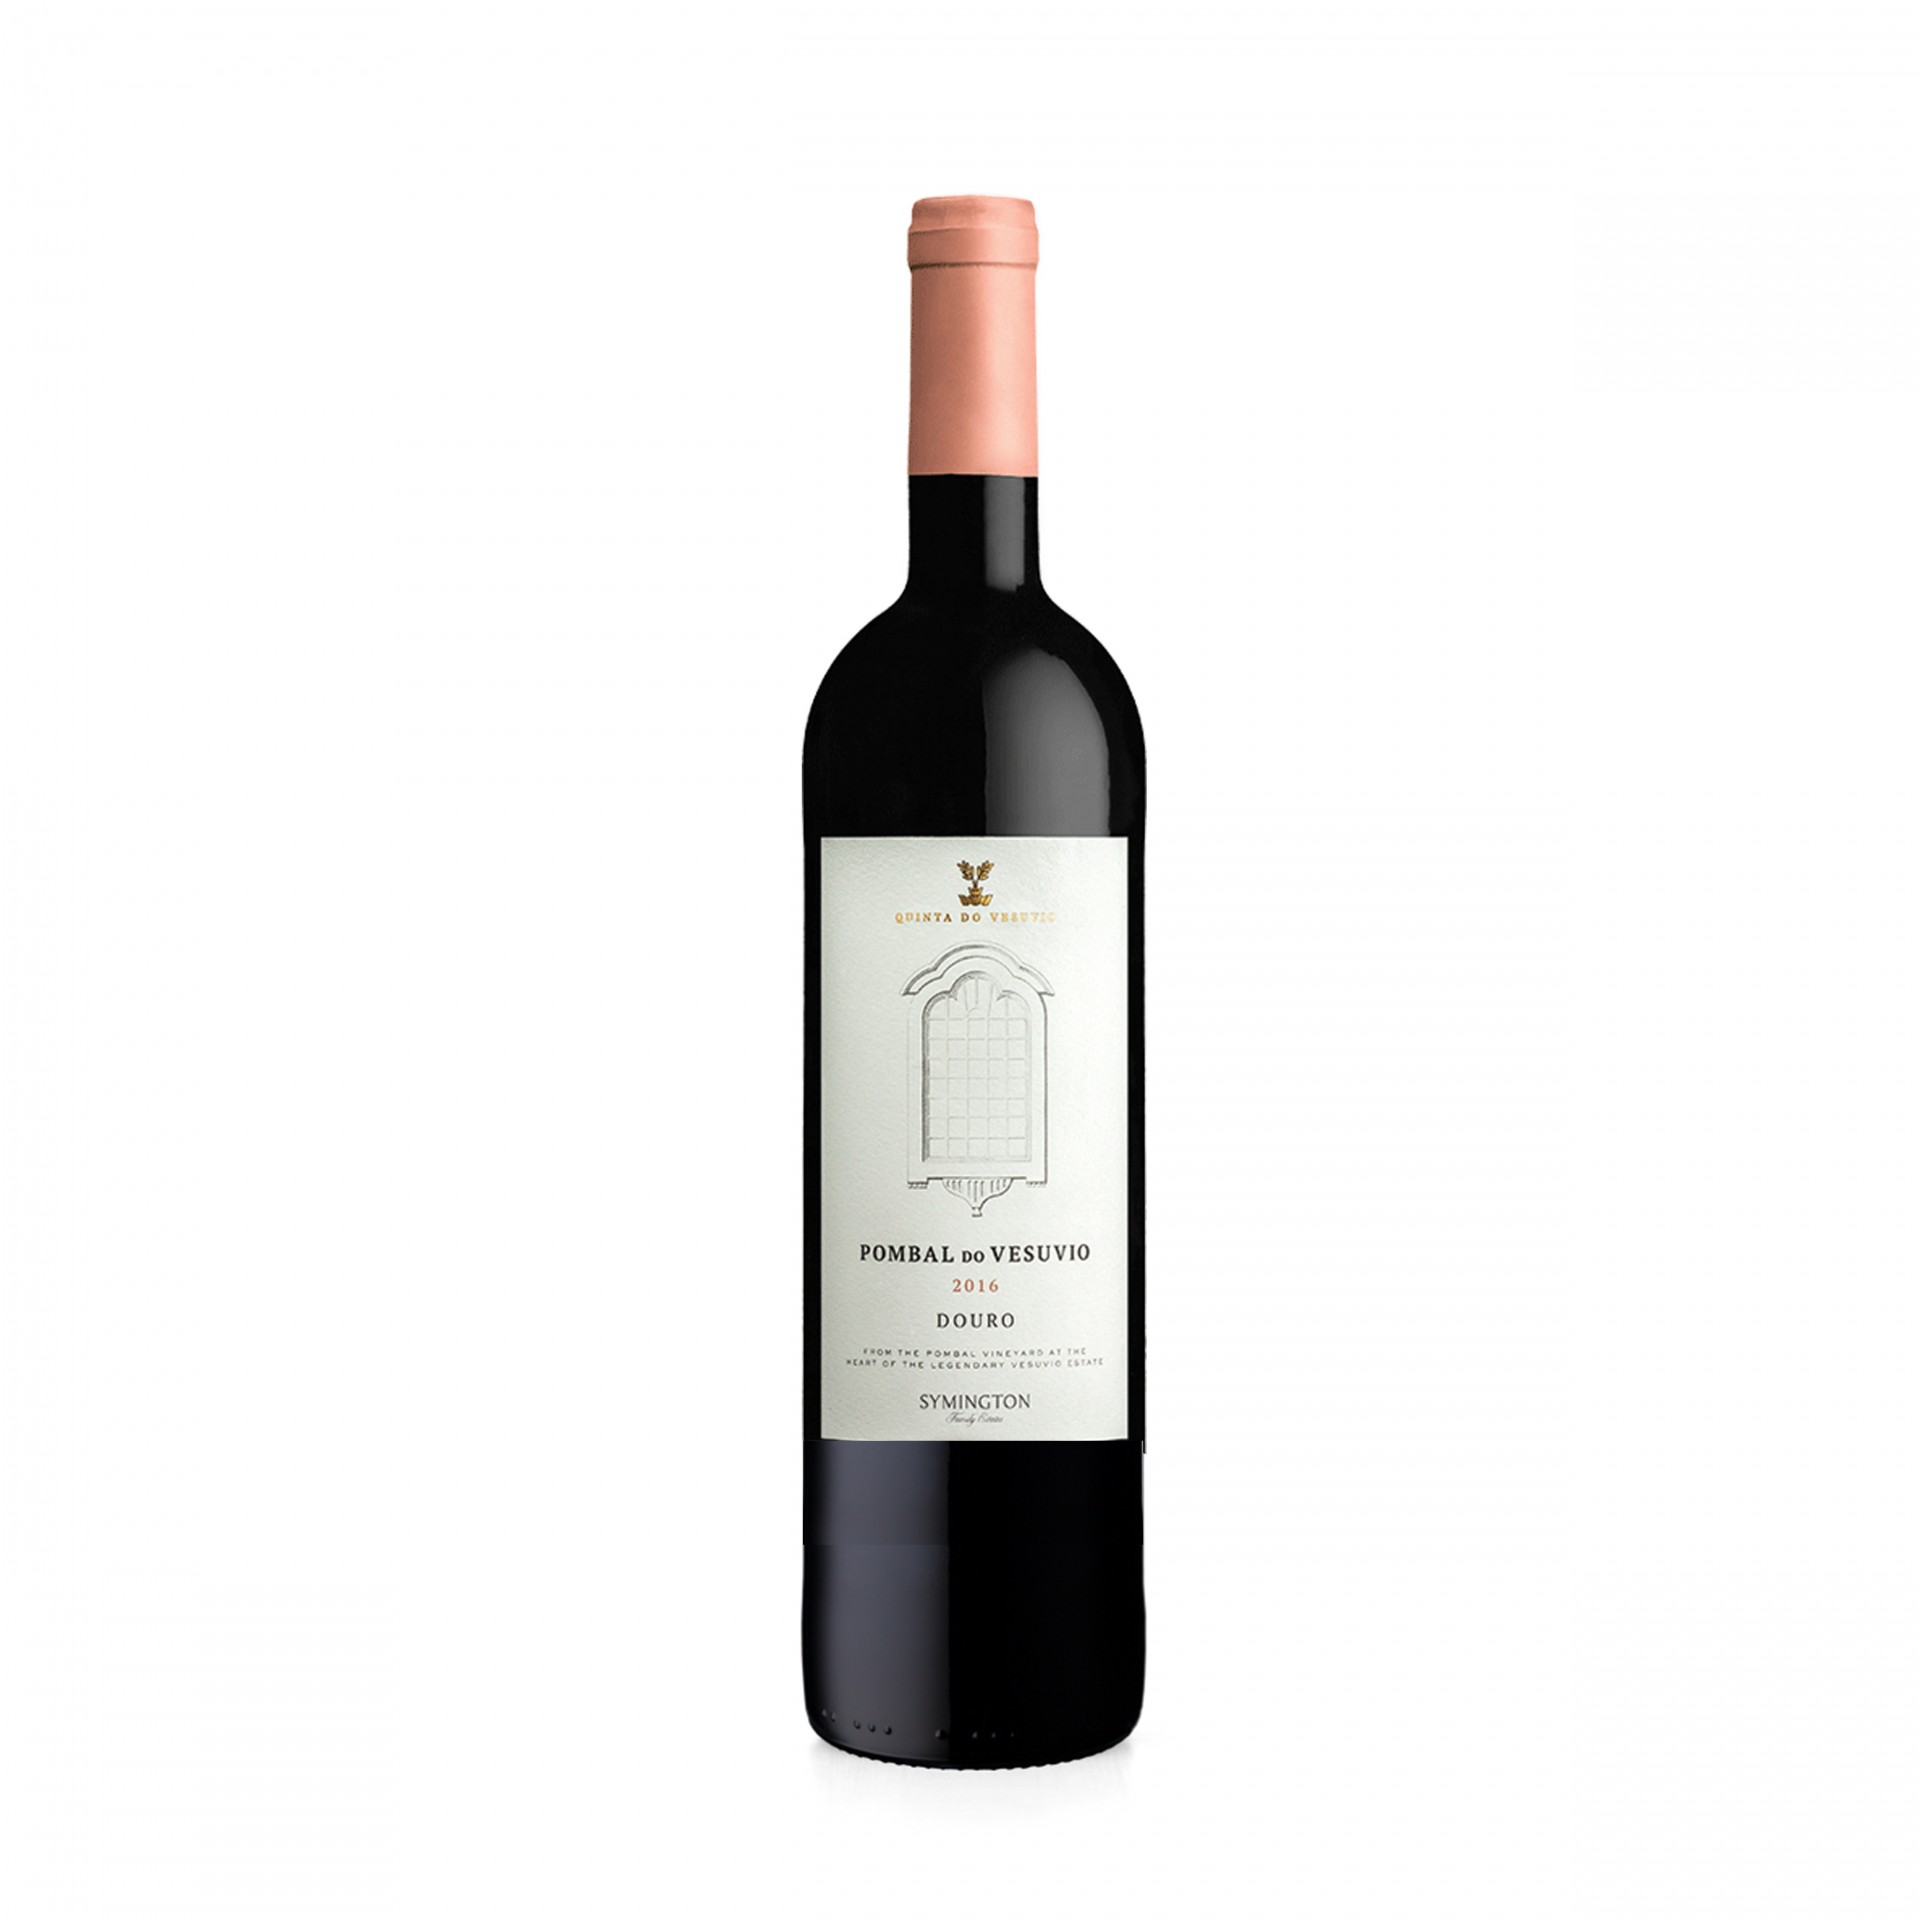 Pombal do Vesuvio 2016 Vinho Tinto Douro DOC